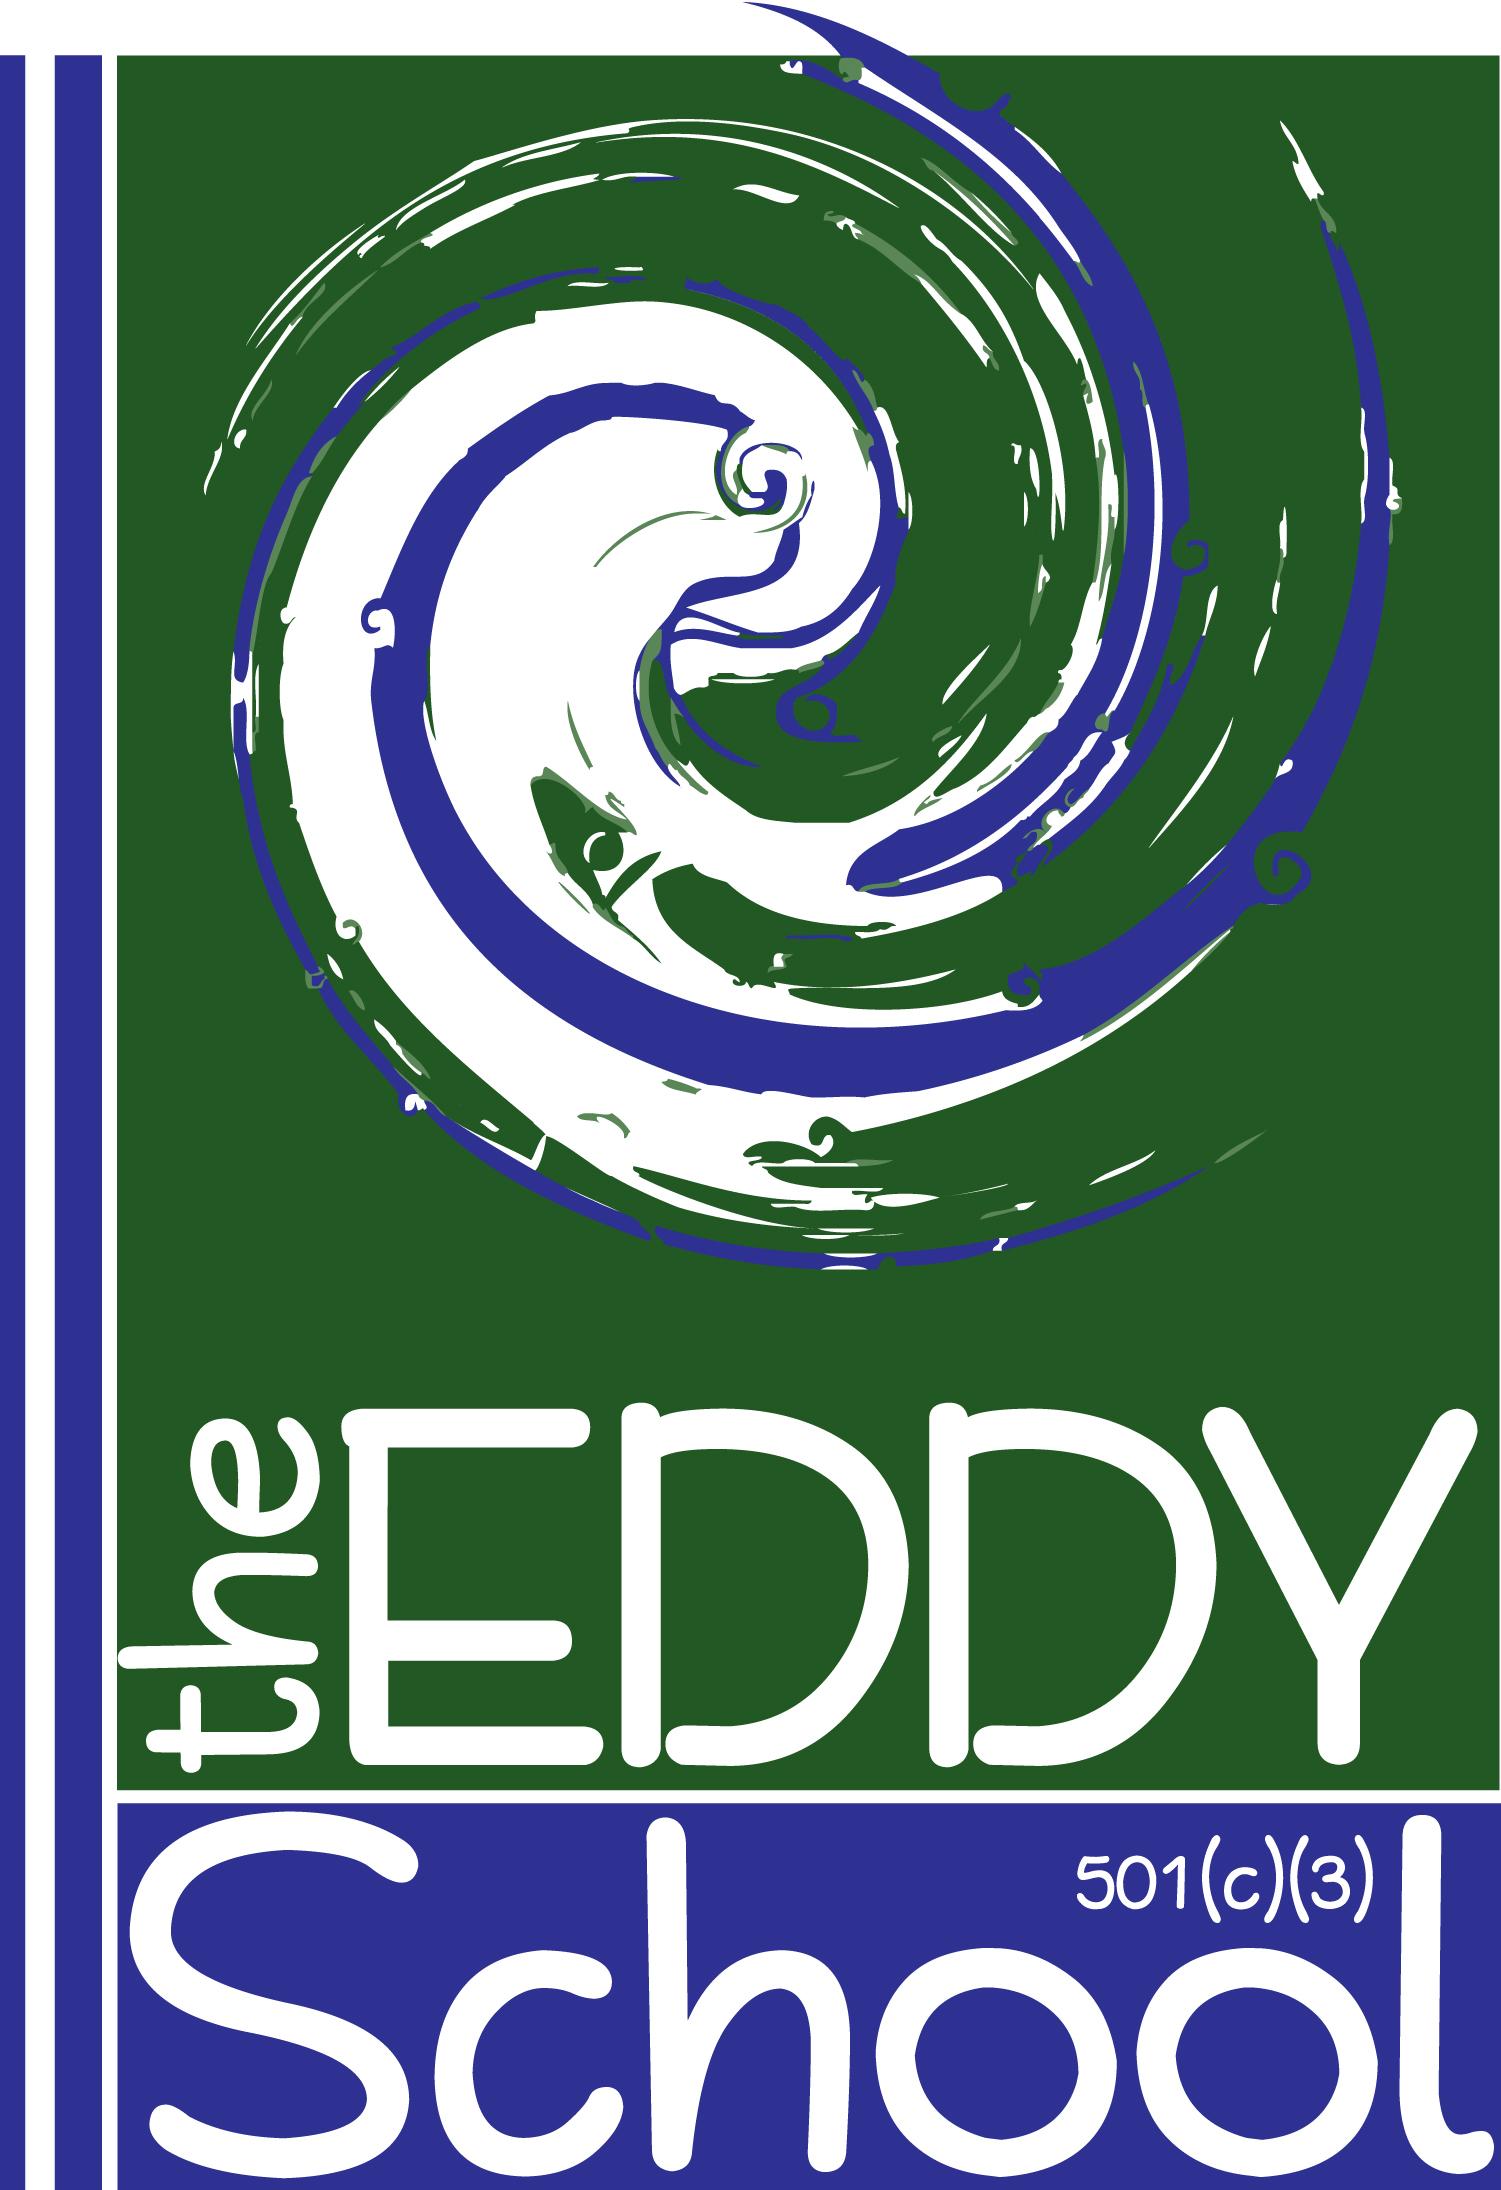 The Eddy School